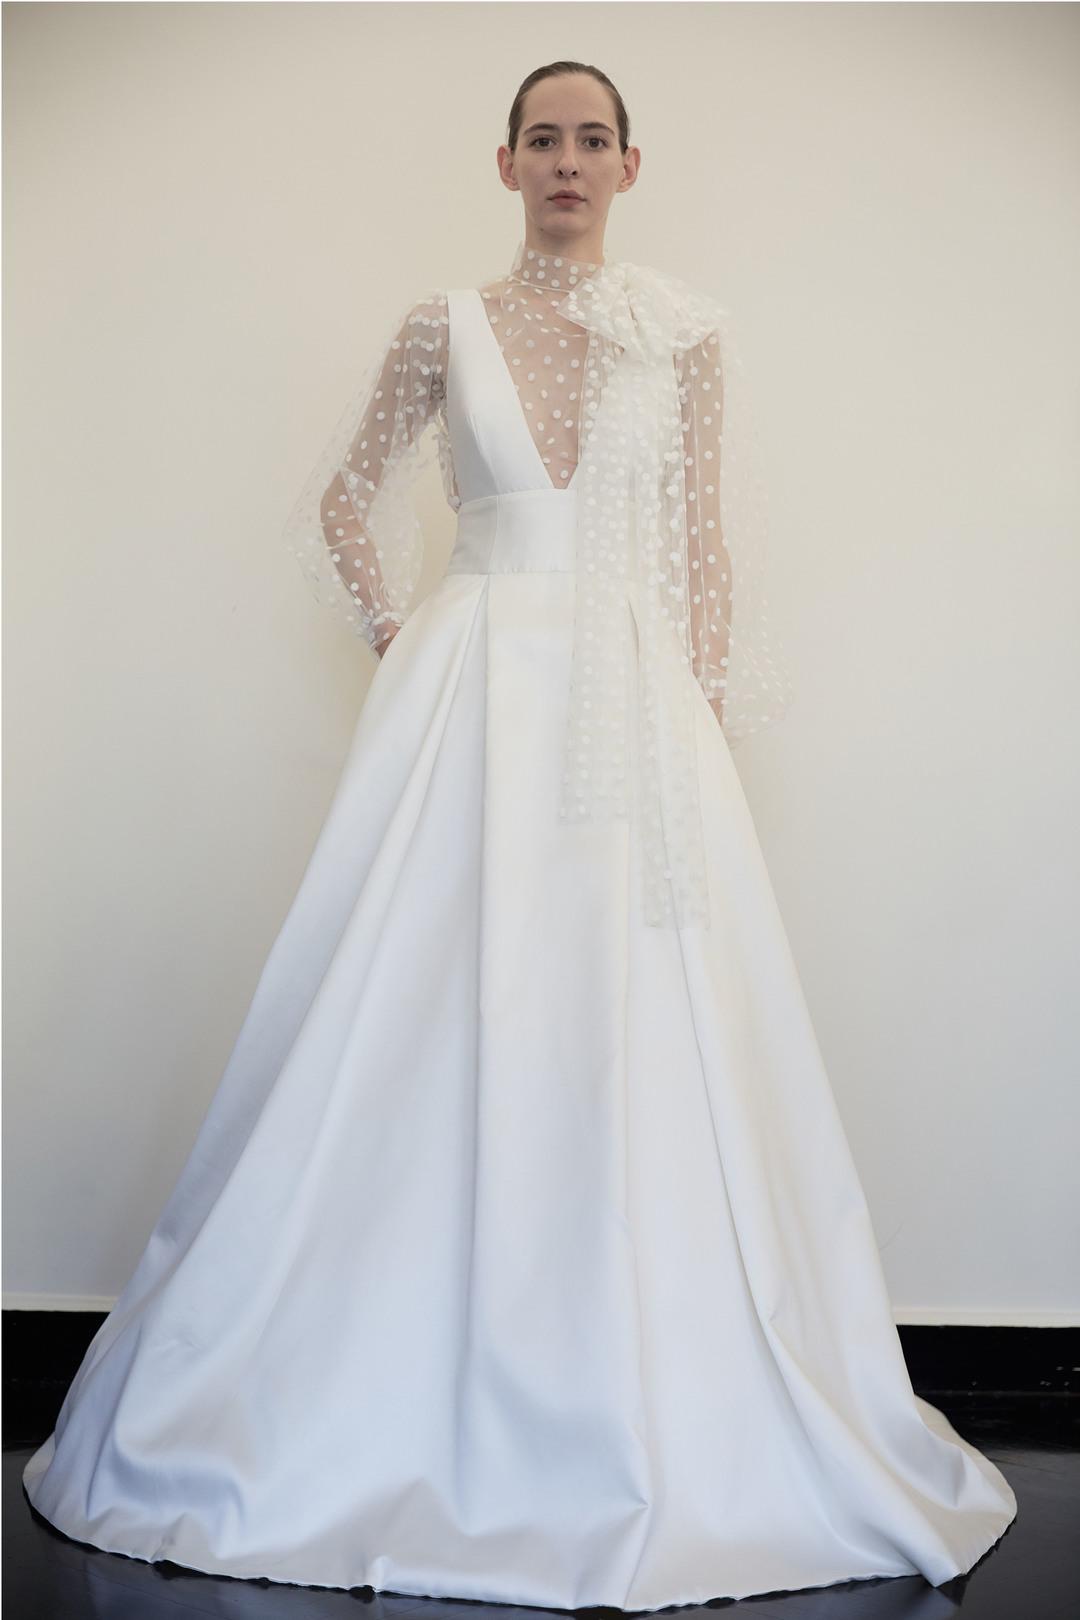 acantha dress photo